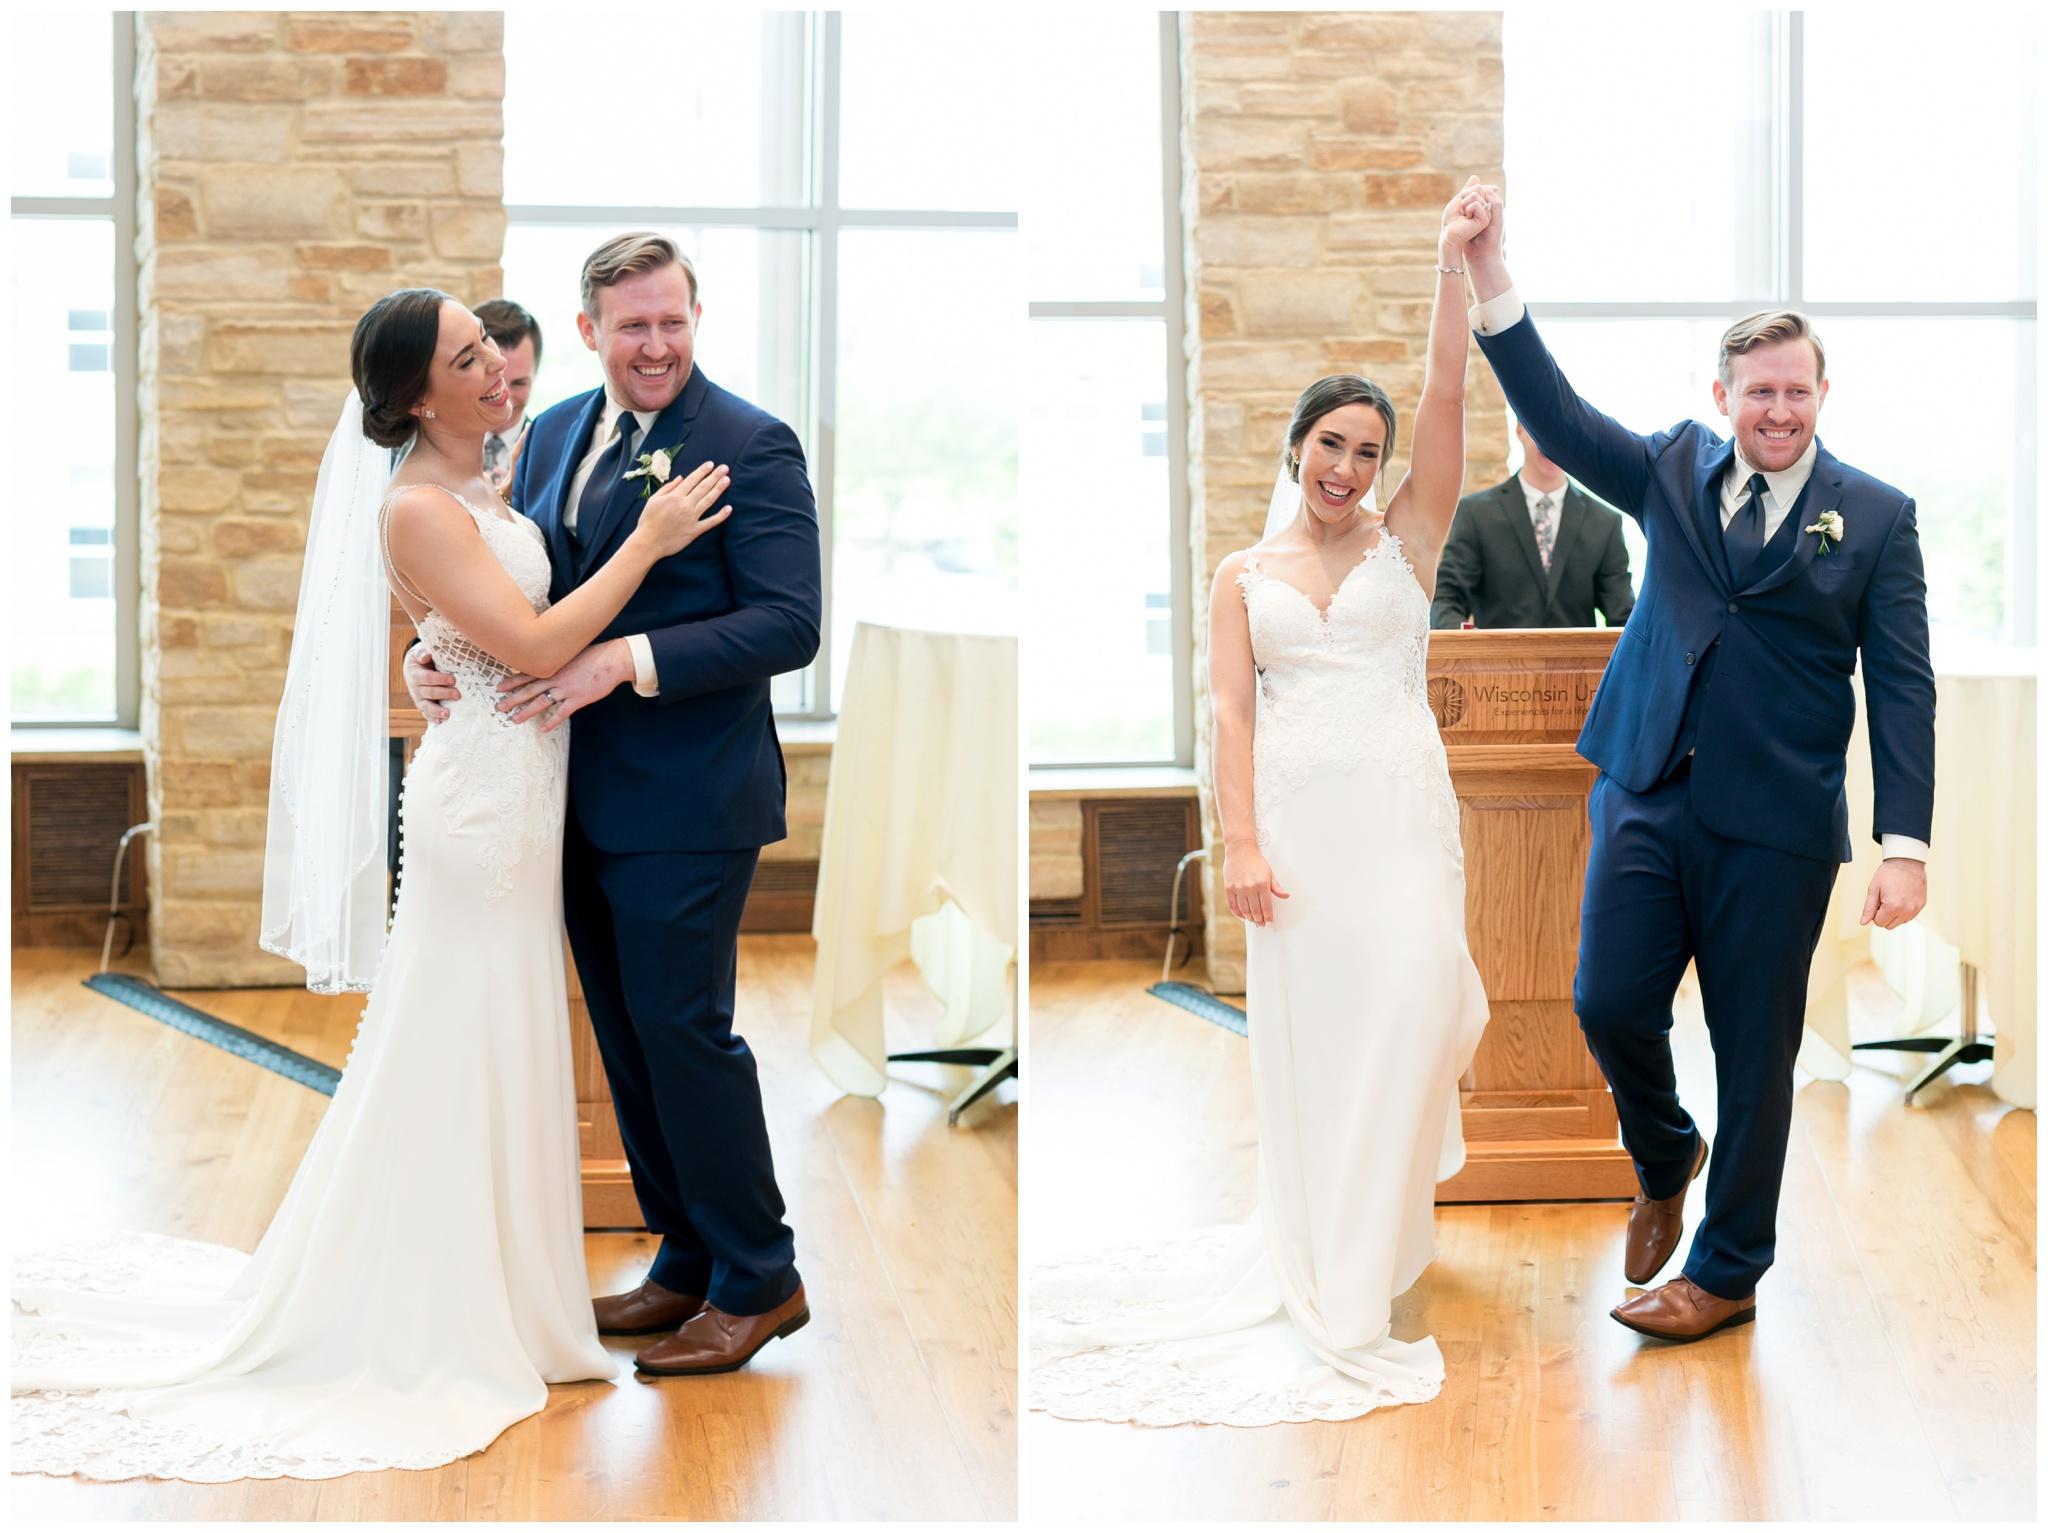 Union_south_Wedding_Madison_Wisconsin_Caynay_Photo_3677.jpg